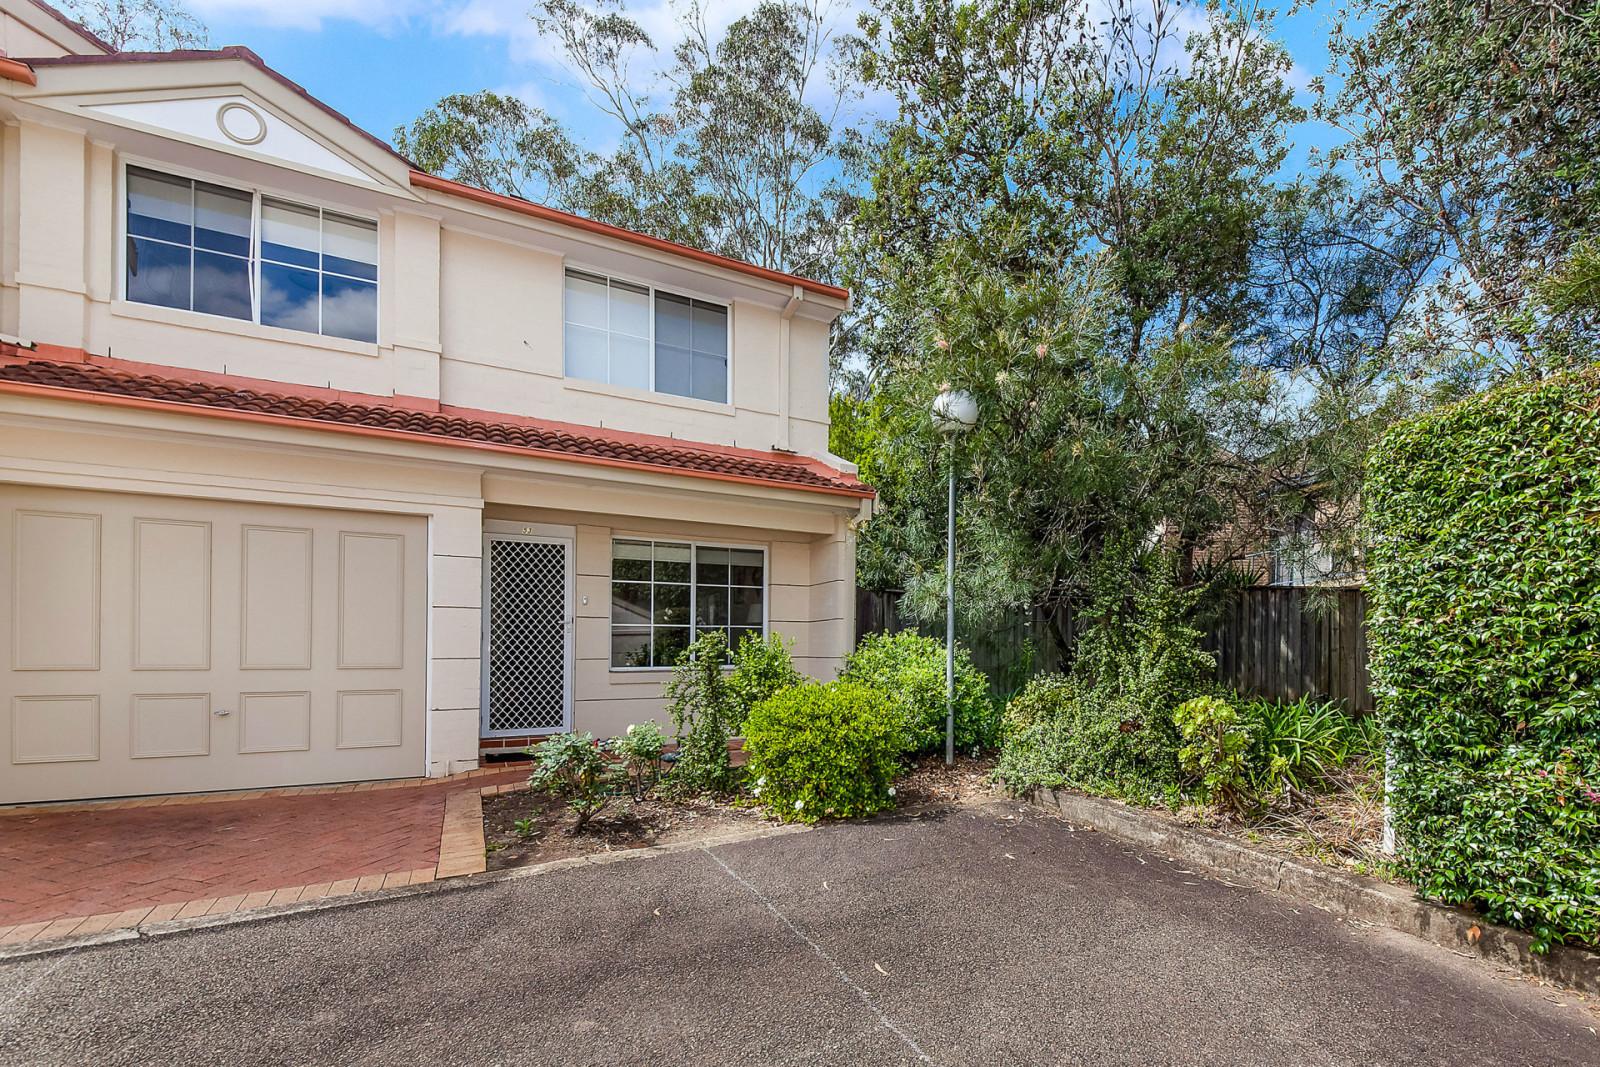 53/1-5 Busaco  Road, Marsfield NSW 2122, Image 0